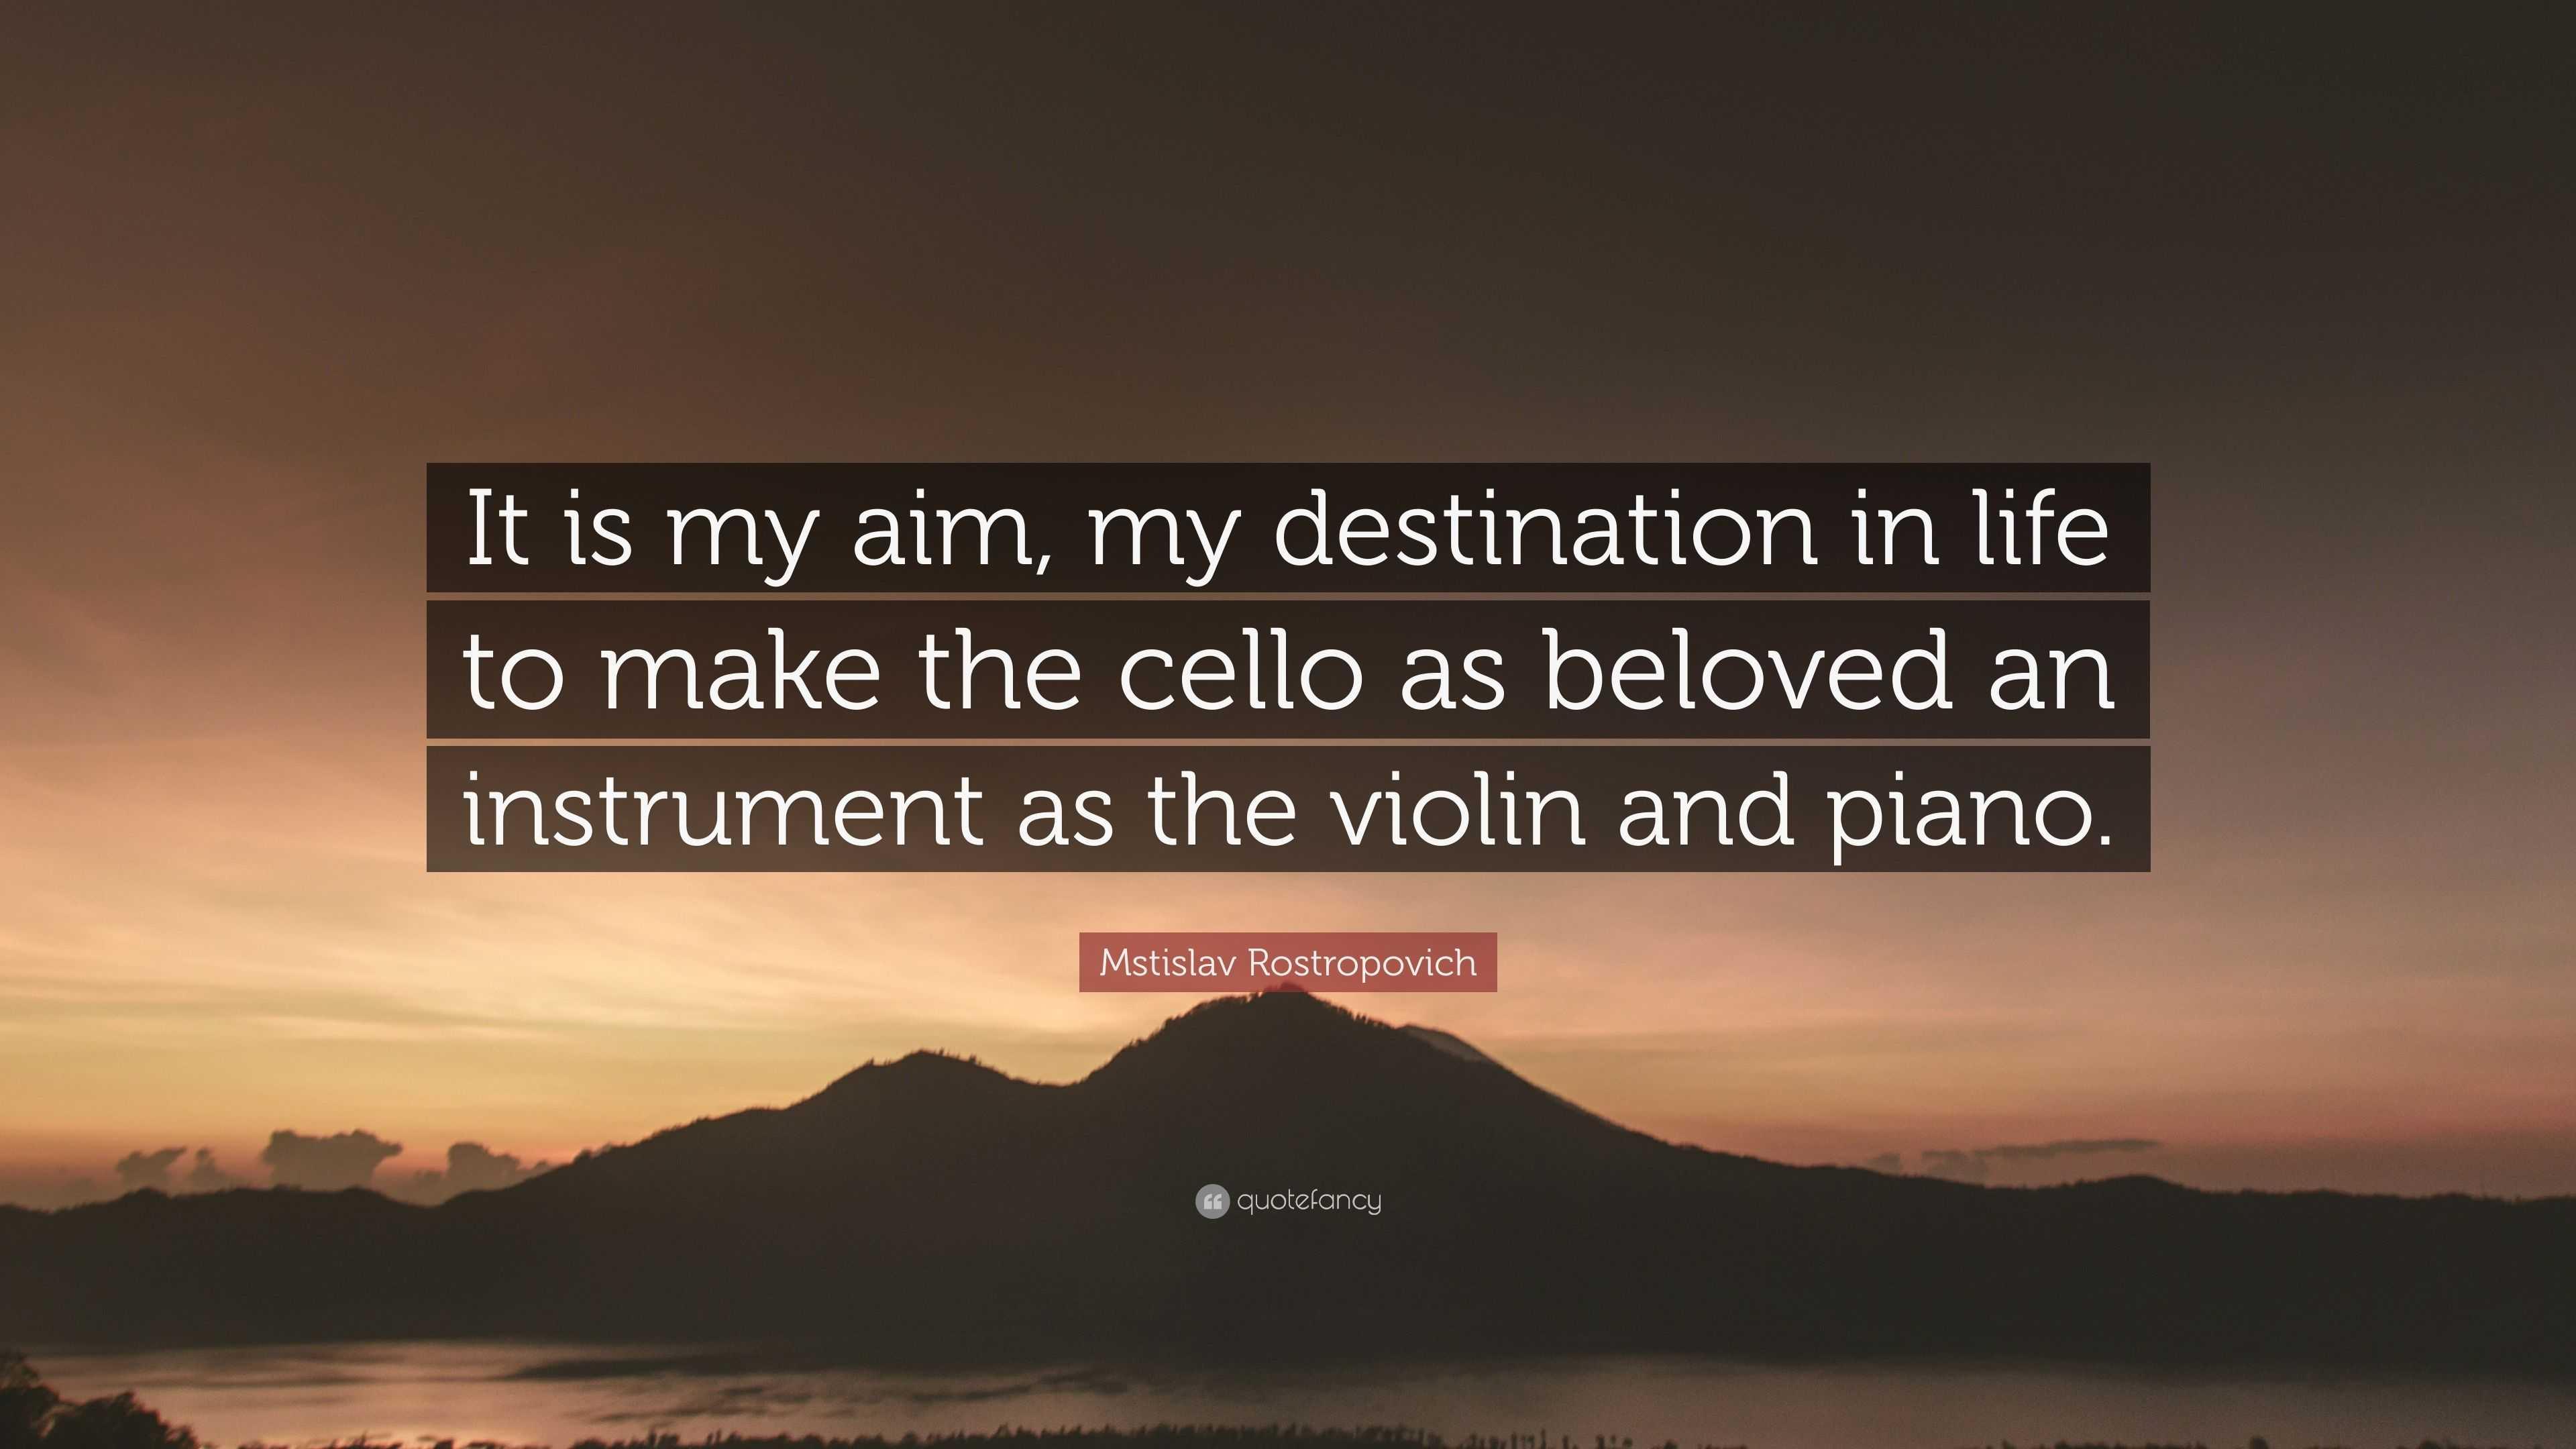 Mstislav Rostropovich Quote It Is My Aim Destination In Life To Make